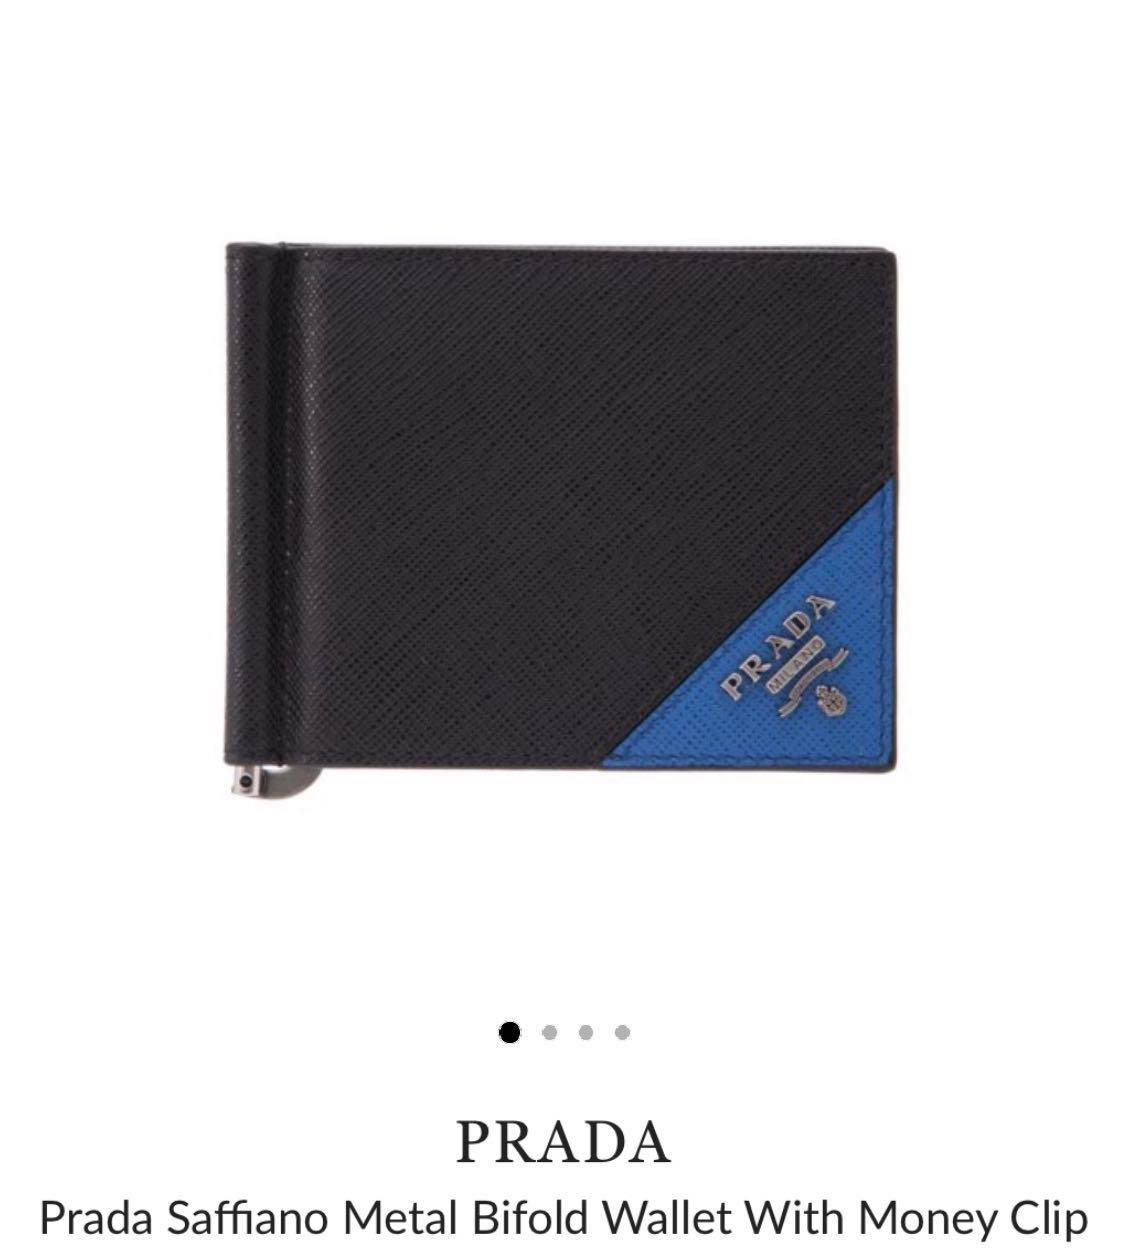 26113866db912f Prada Saffiano Metal Bifold Wallet With Money Clip, Luxury, Bags ...